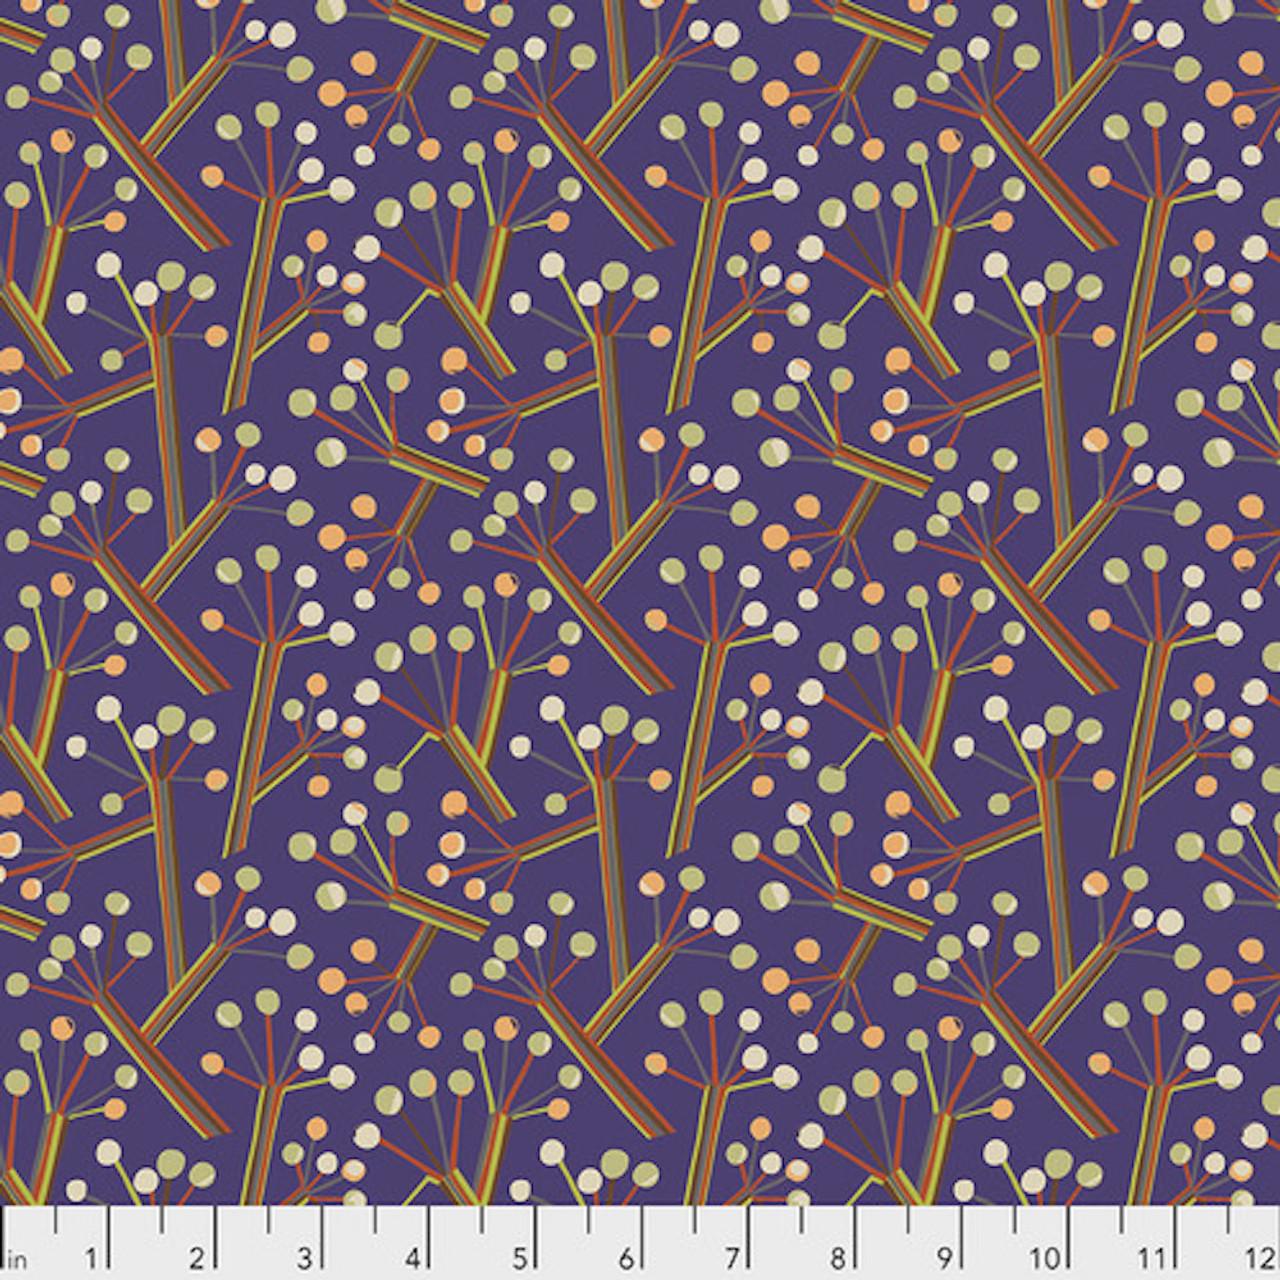 Kathy Doughty PWMO034 Seeds & Stems Bush Lily Royal Cotton Fabric By Yard